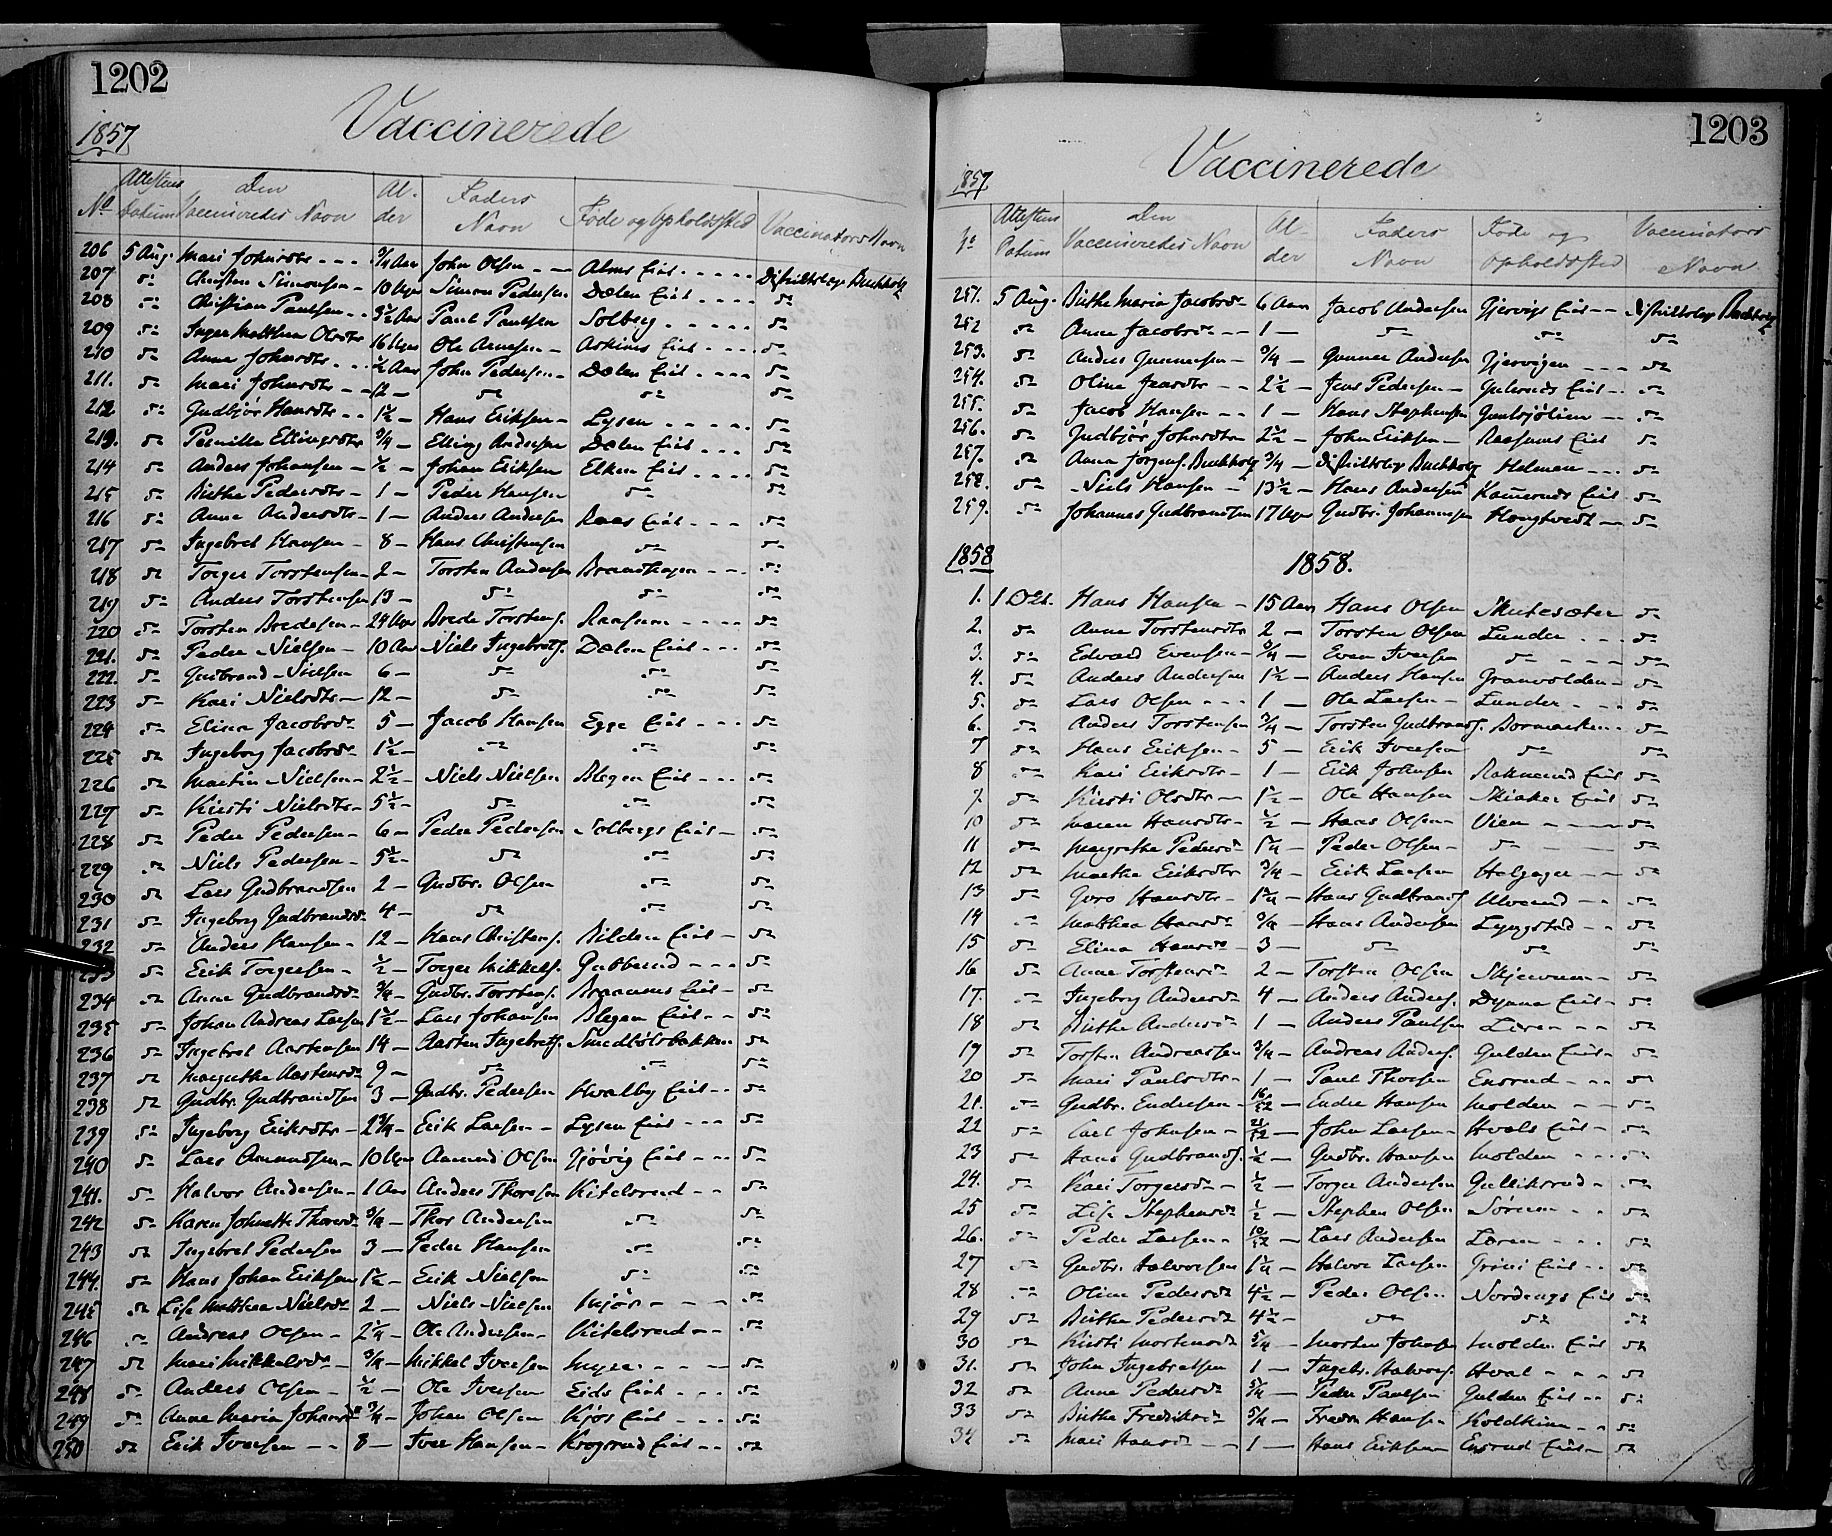 SAH, Gran prestekontor, Ministerialbok nr. 12, 1856-1874, s. 1202-1203